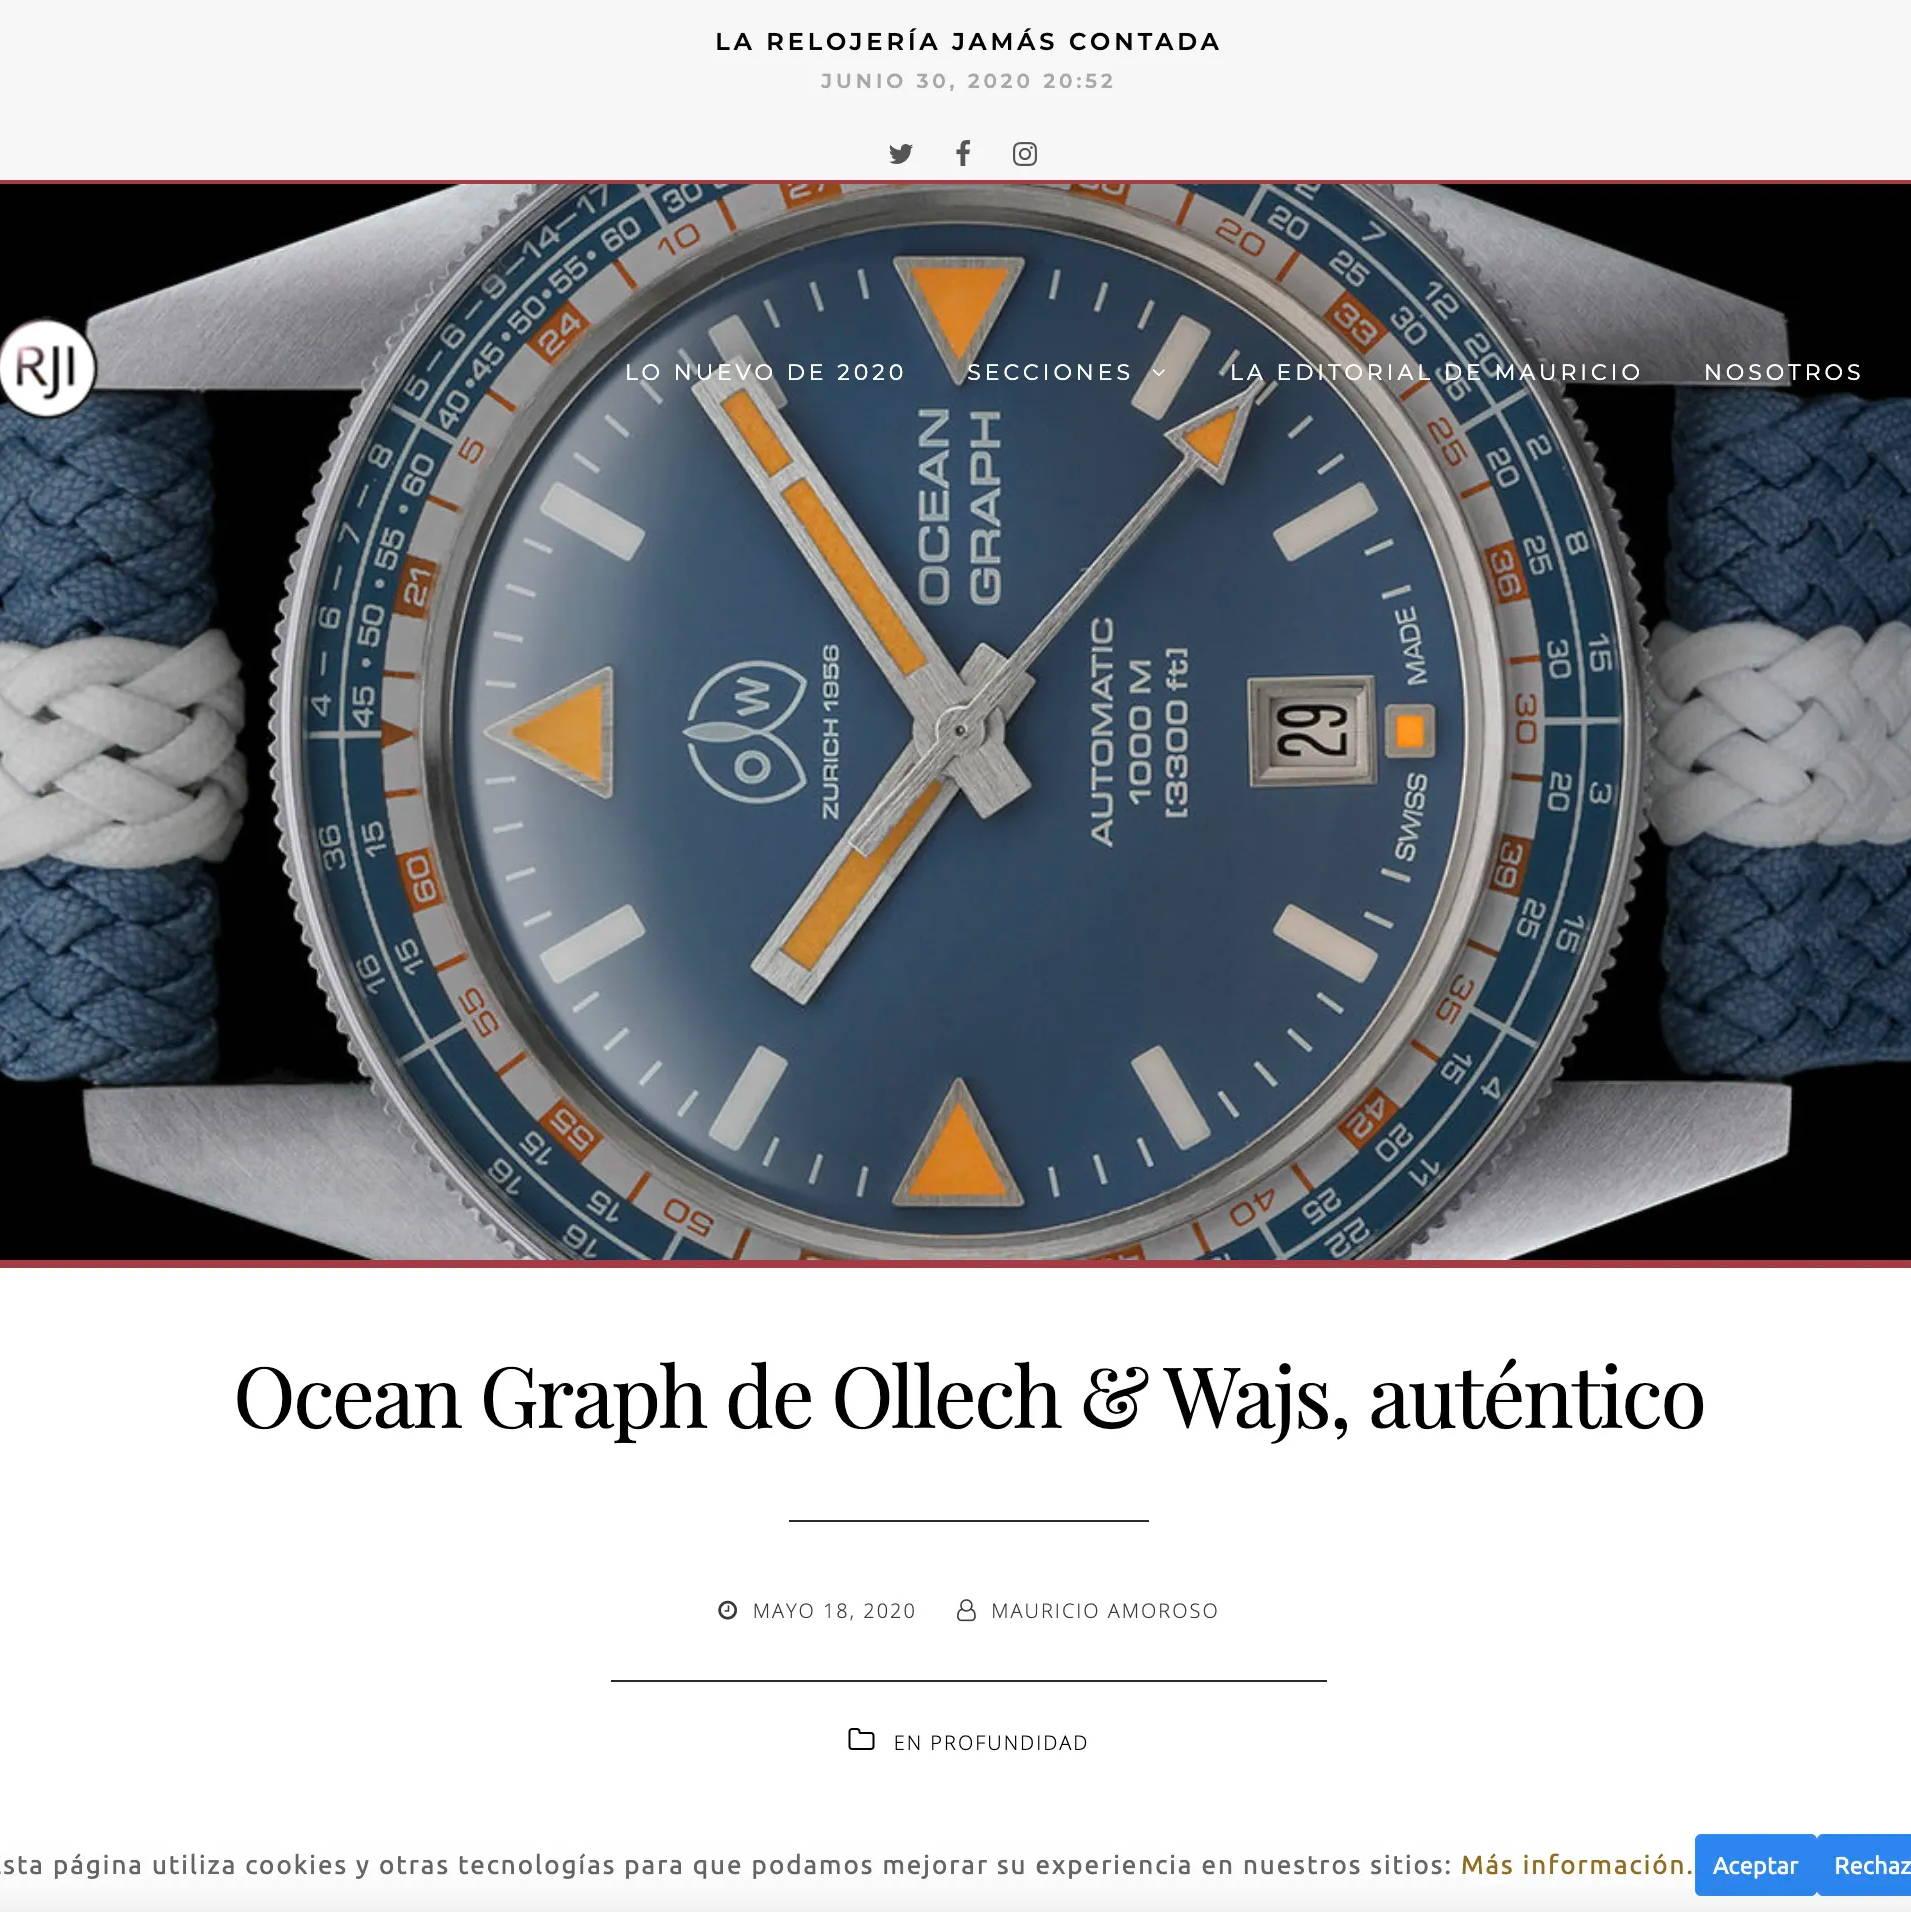 Relojes increibiles ollech and wajs ocean grap